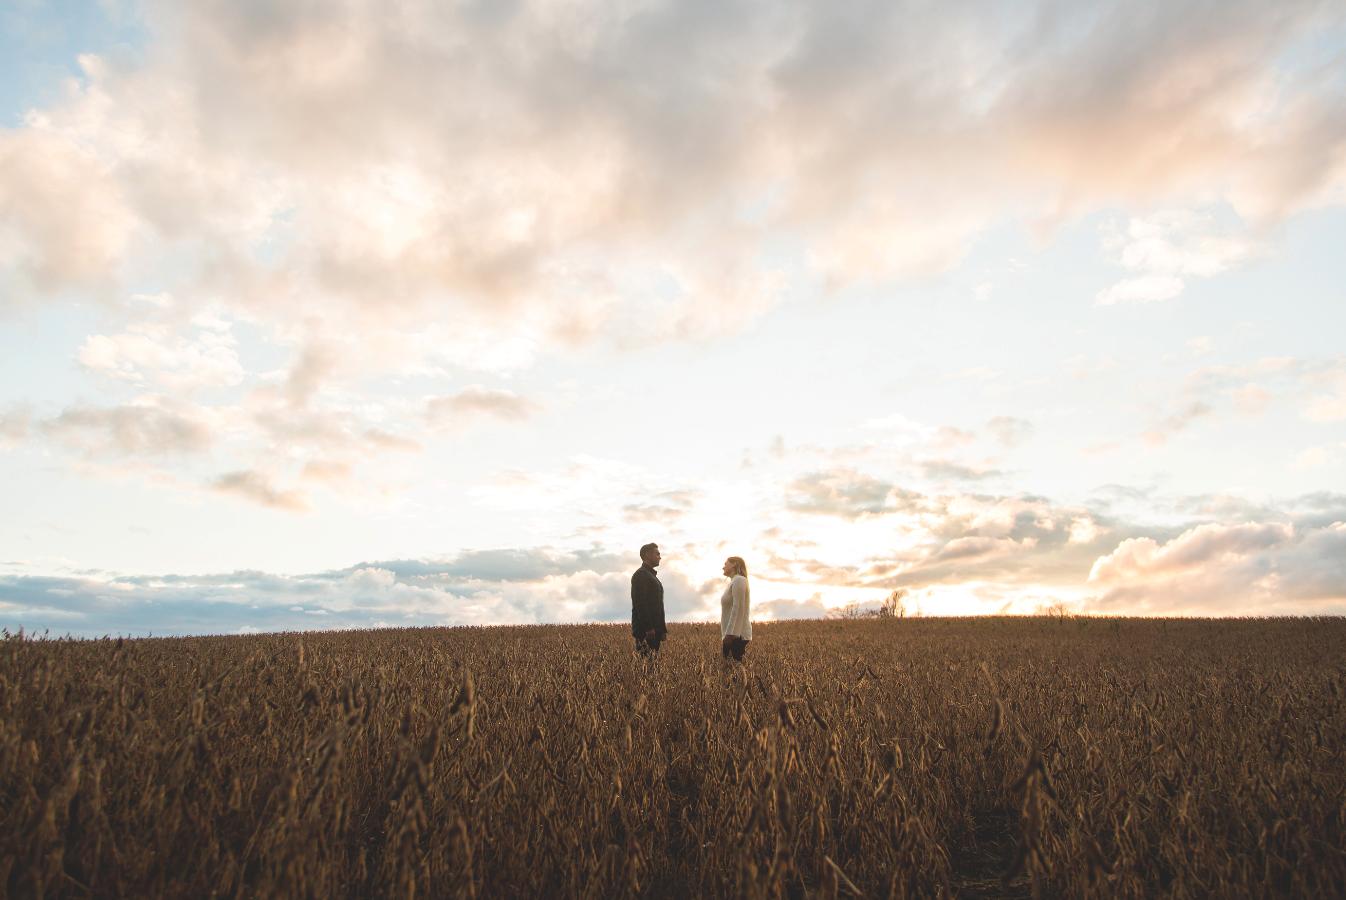 Engagement-Photography-Bruce-Trail-Rain-Hamilton-Burlington-Oakville-Niagara-Toronto-Wedding-Photographer-Photo-Image-22.png